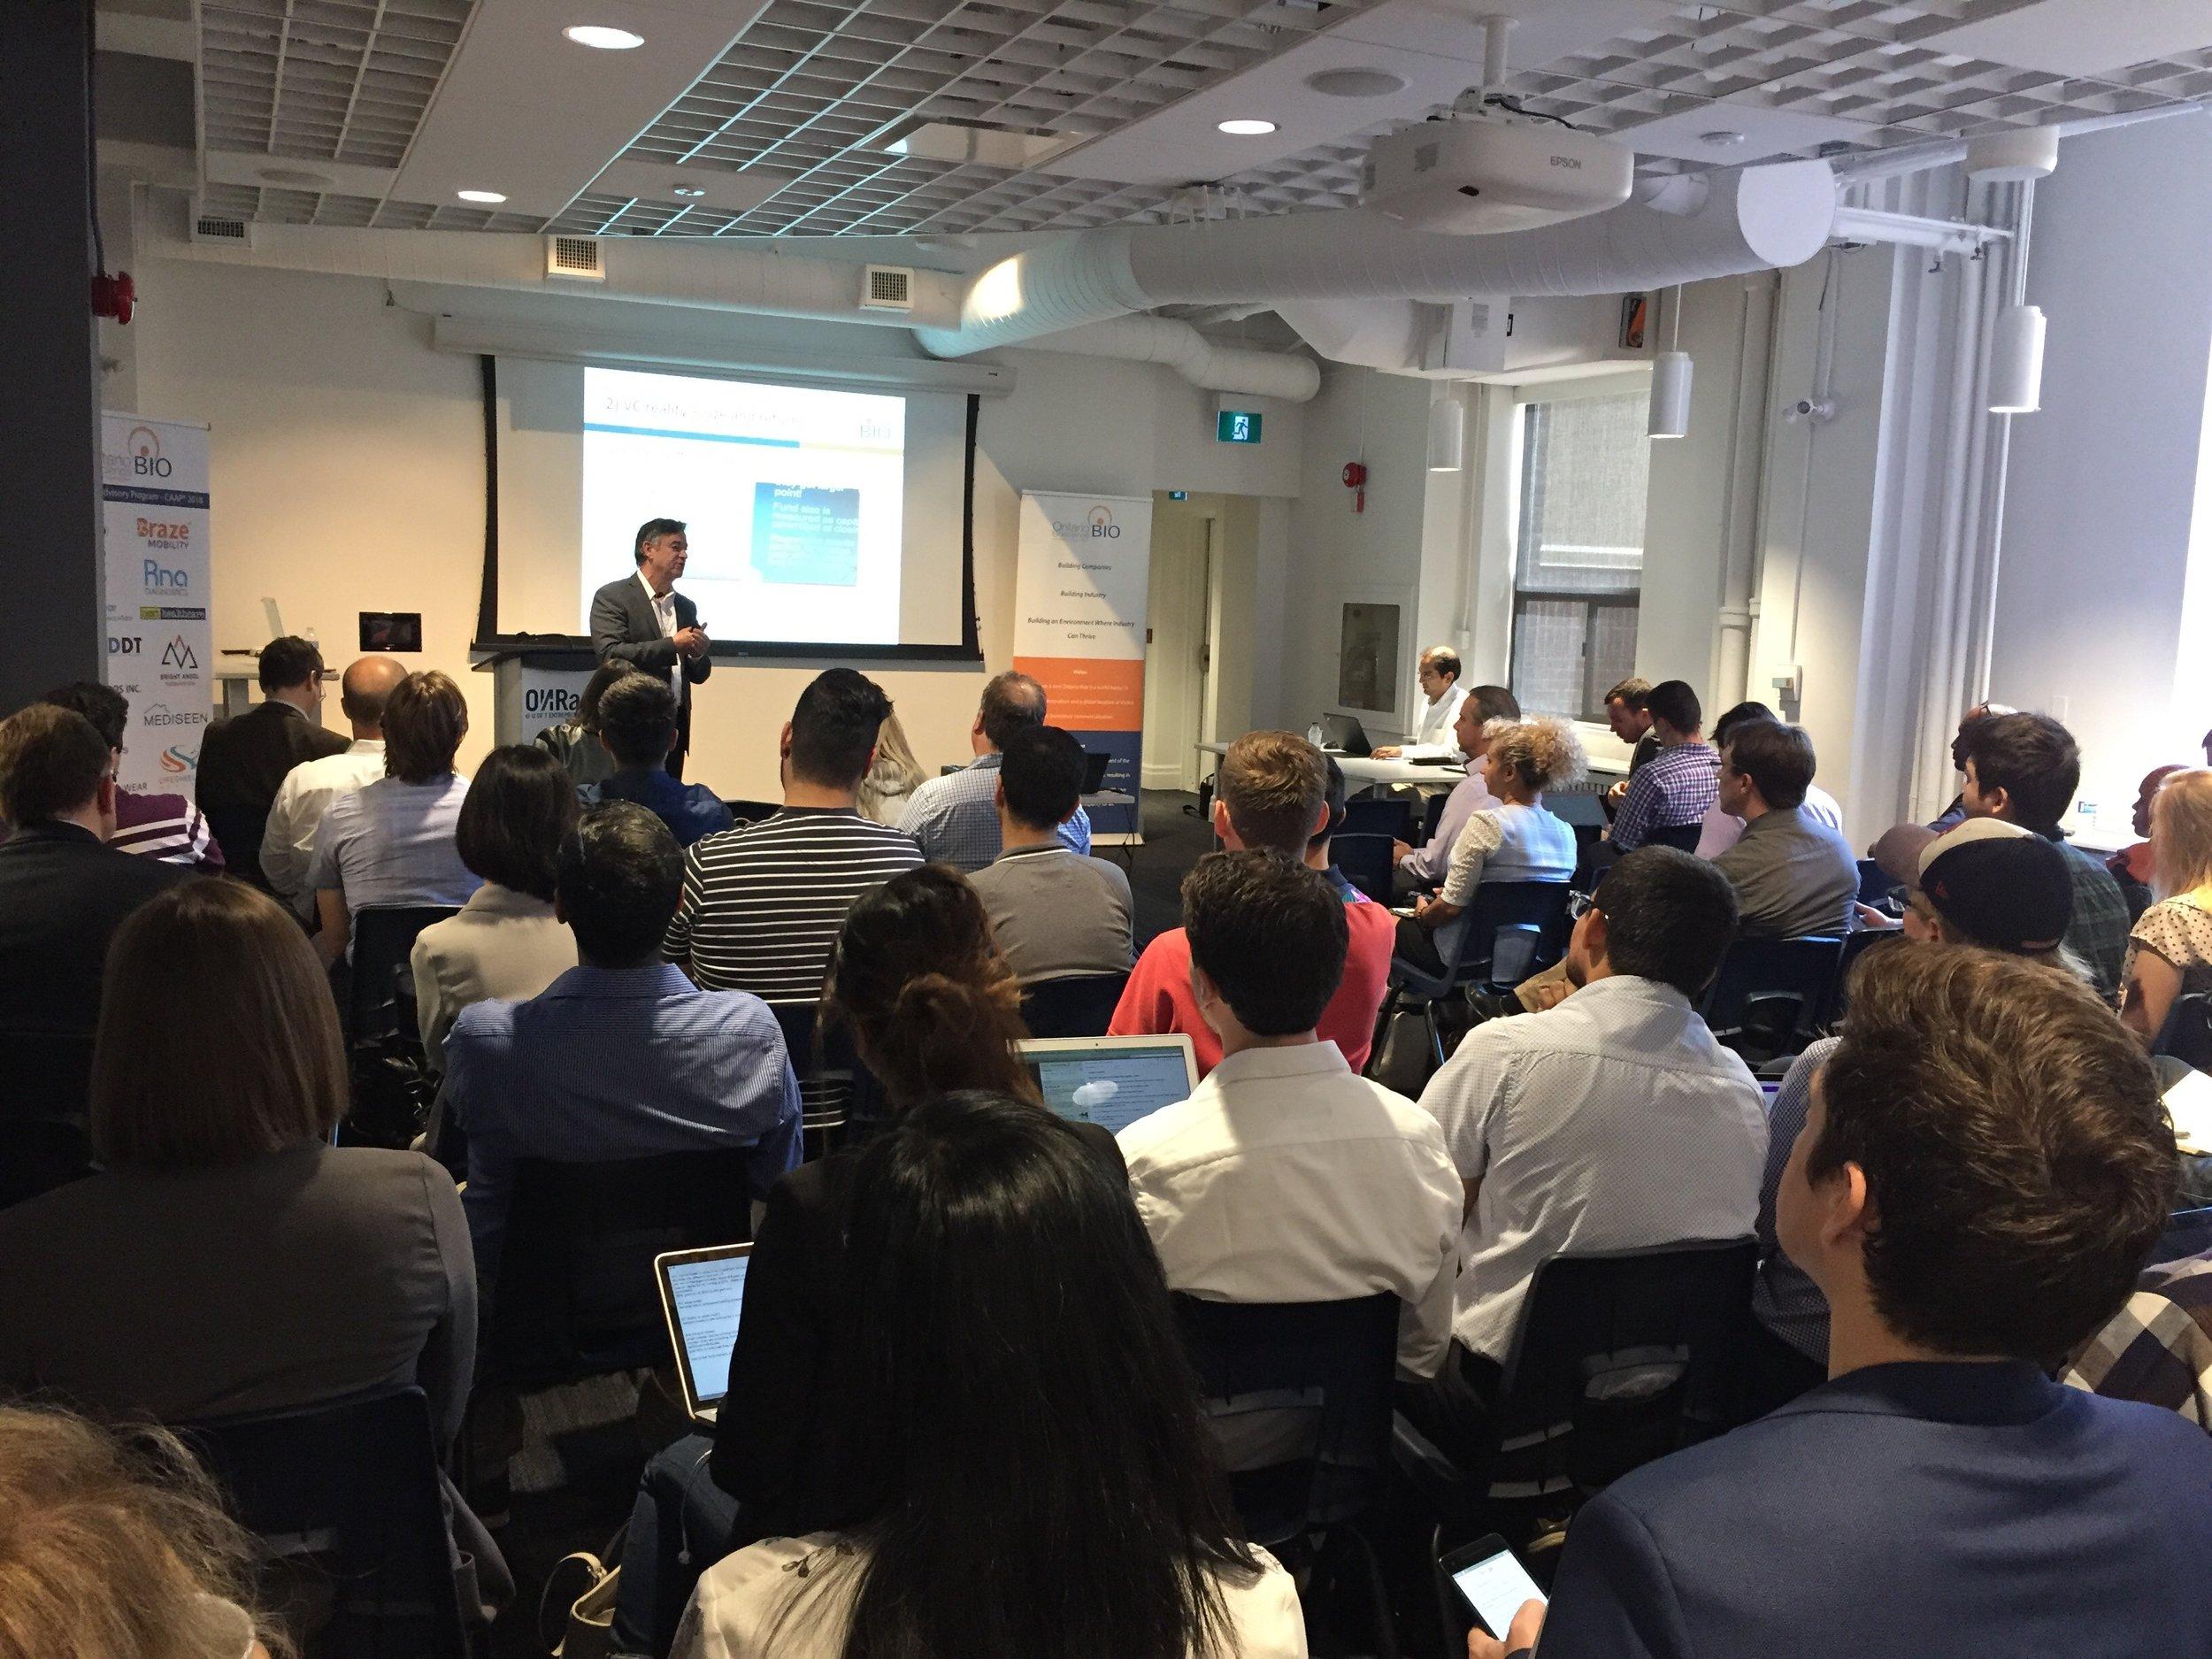 June 25 2018 - Photo - OBIO event - How Do VCs Value Health Science Companies.jpeg